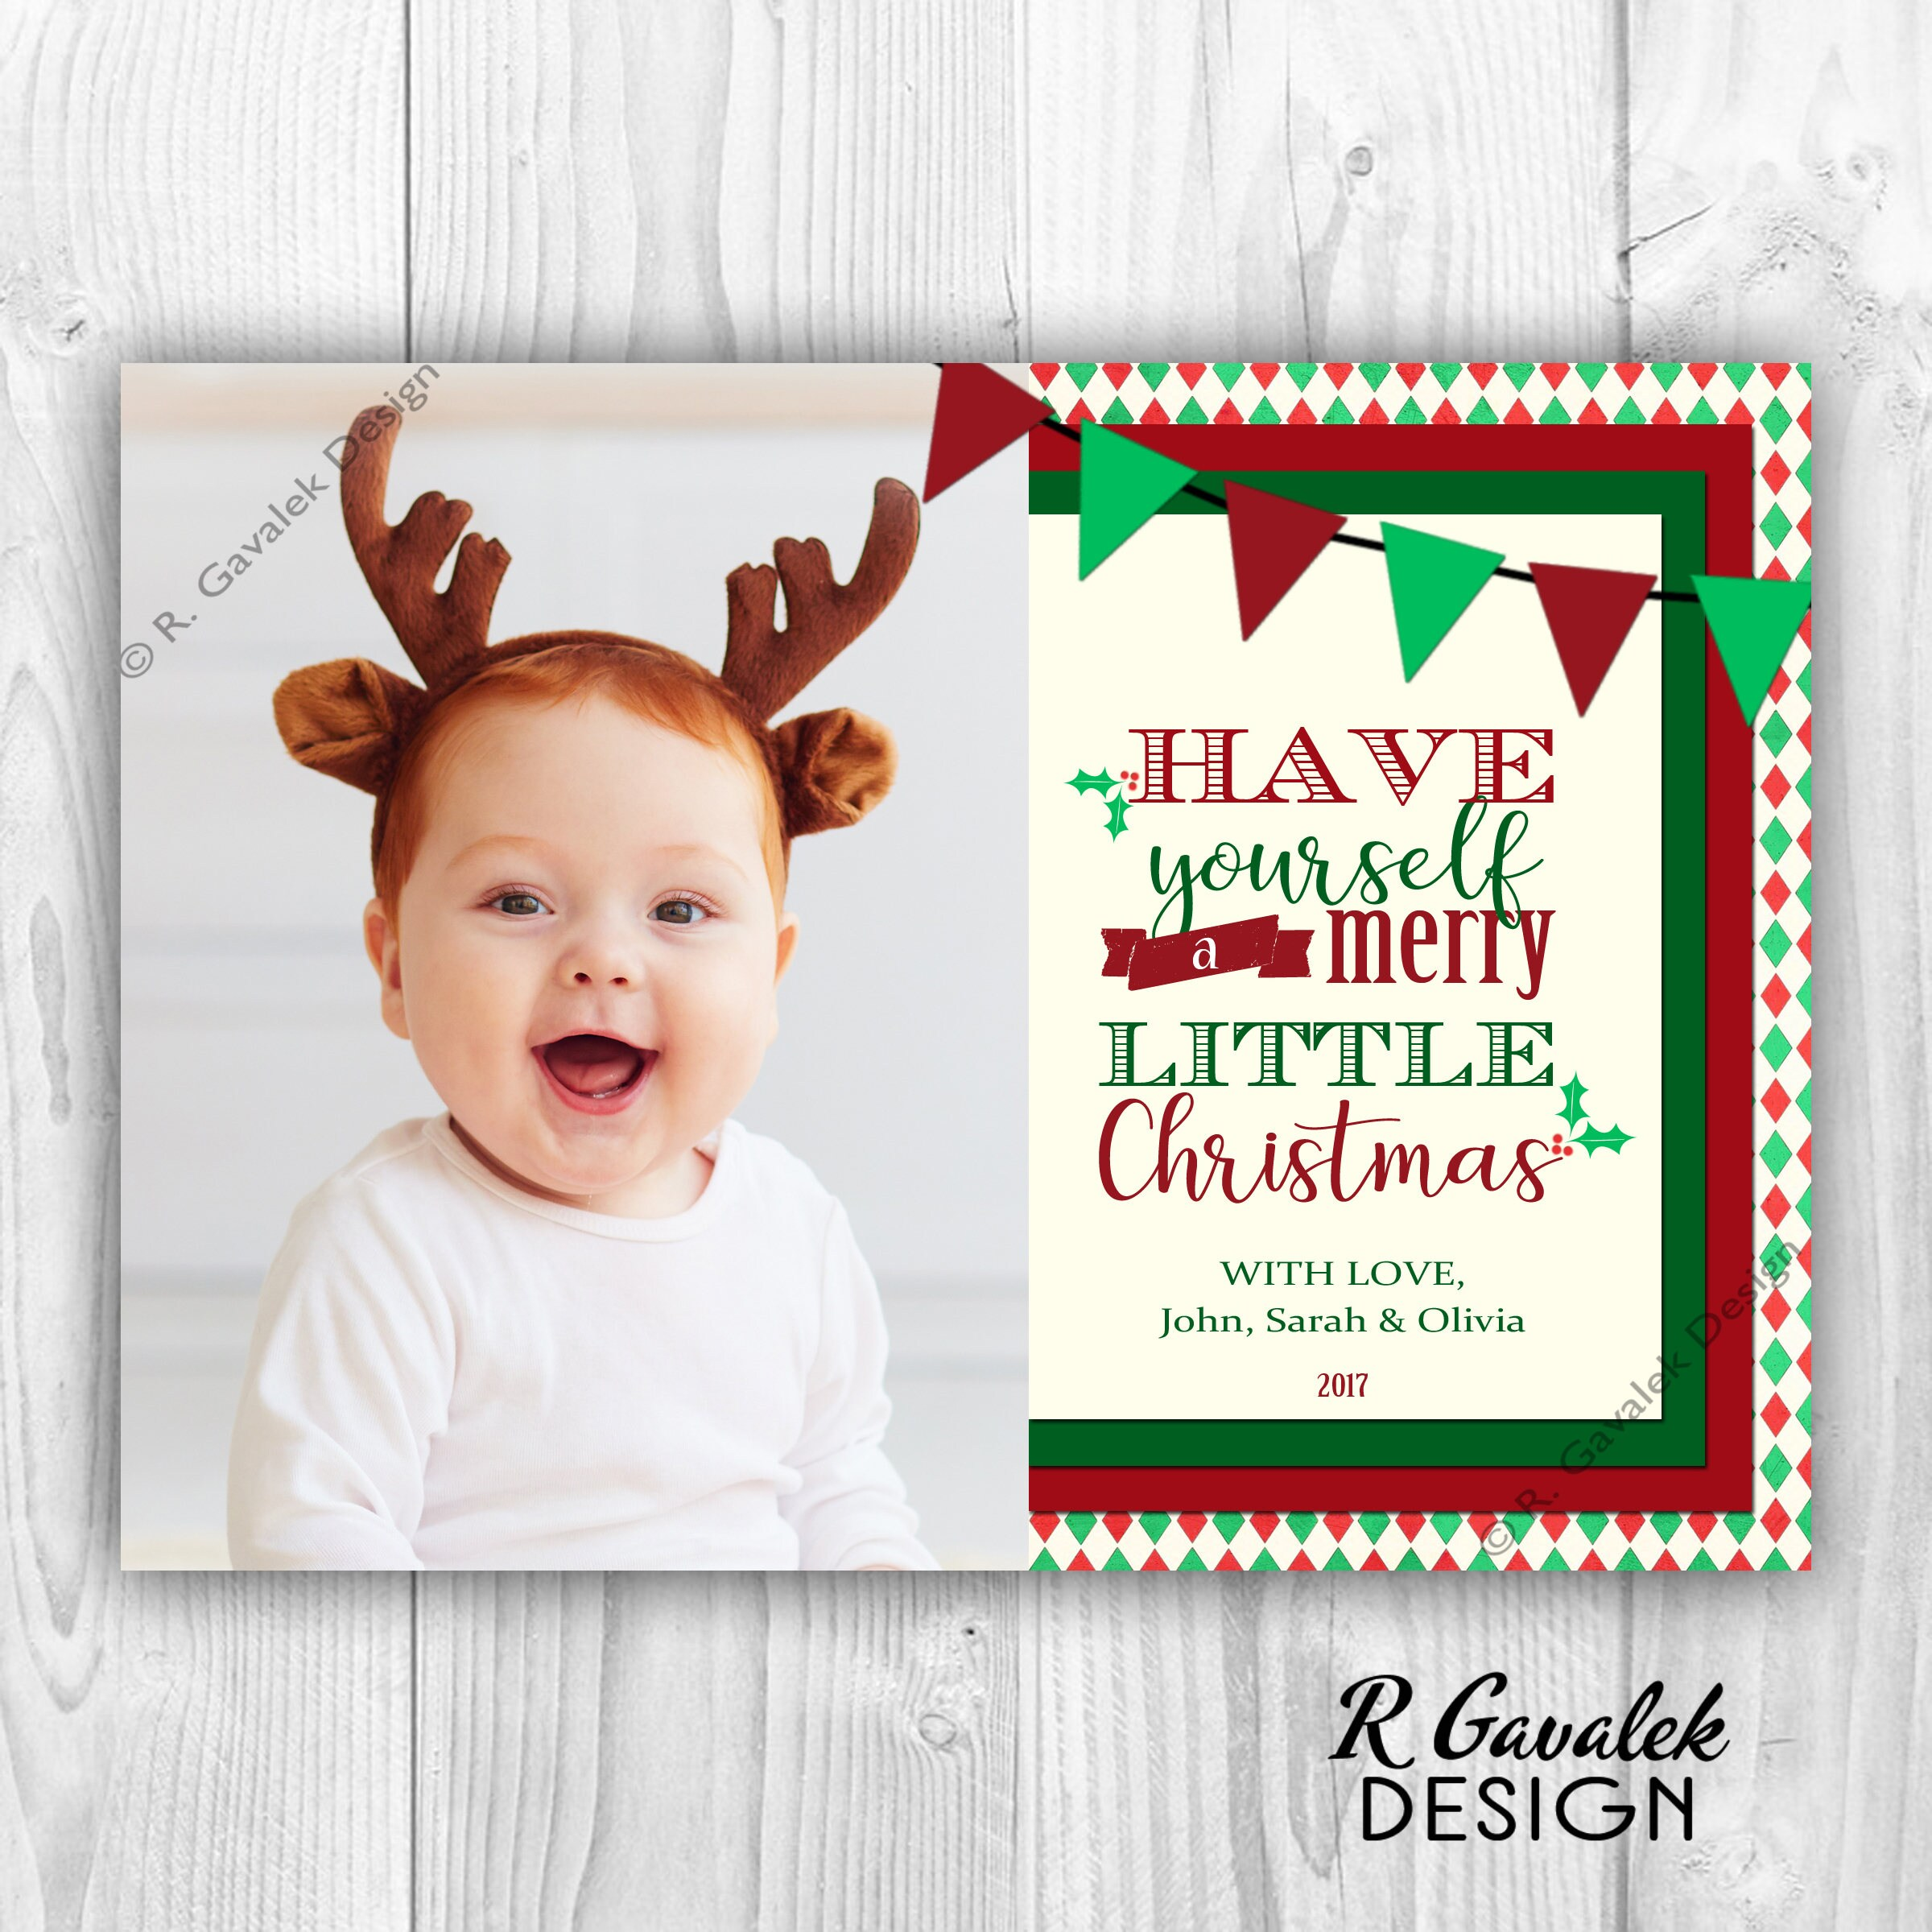 Merry little christmas card photo holiday card diy printable merry little christmas card photo holiday card diy printable christmas card have yourself solutioingenieria Gallery